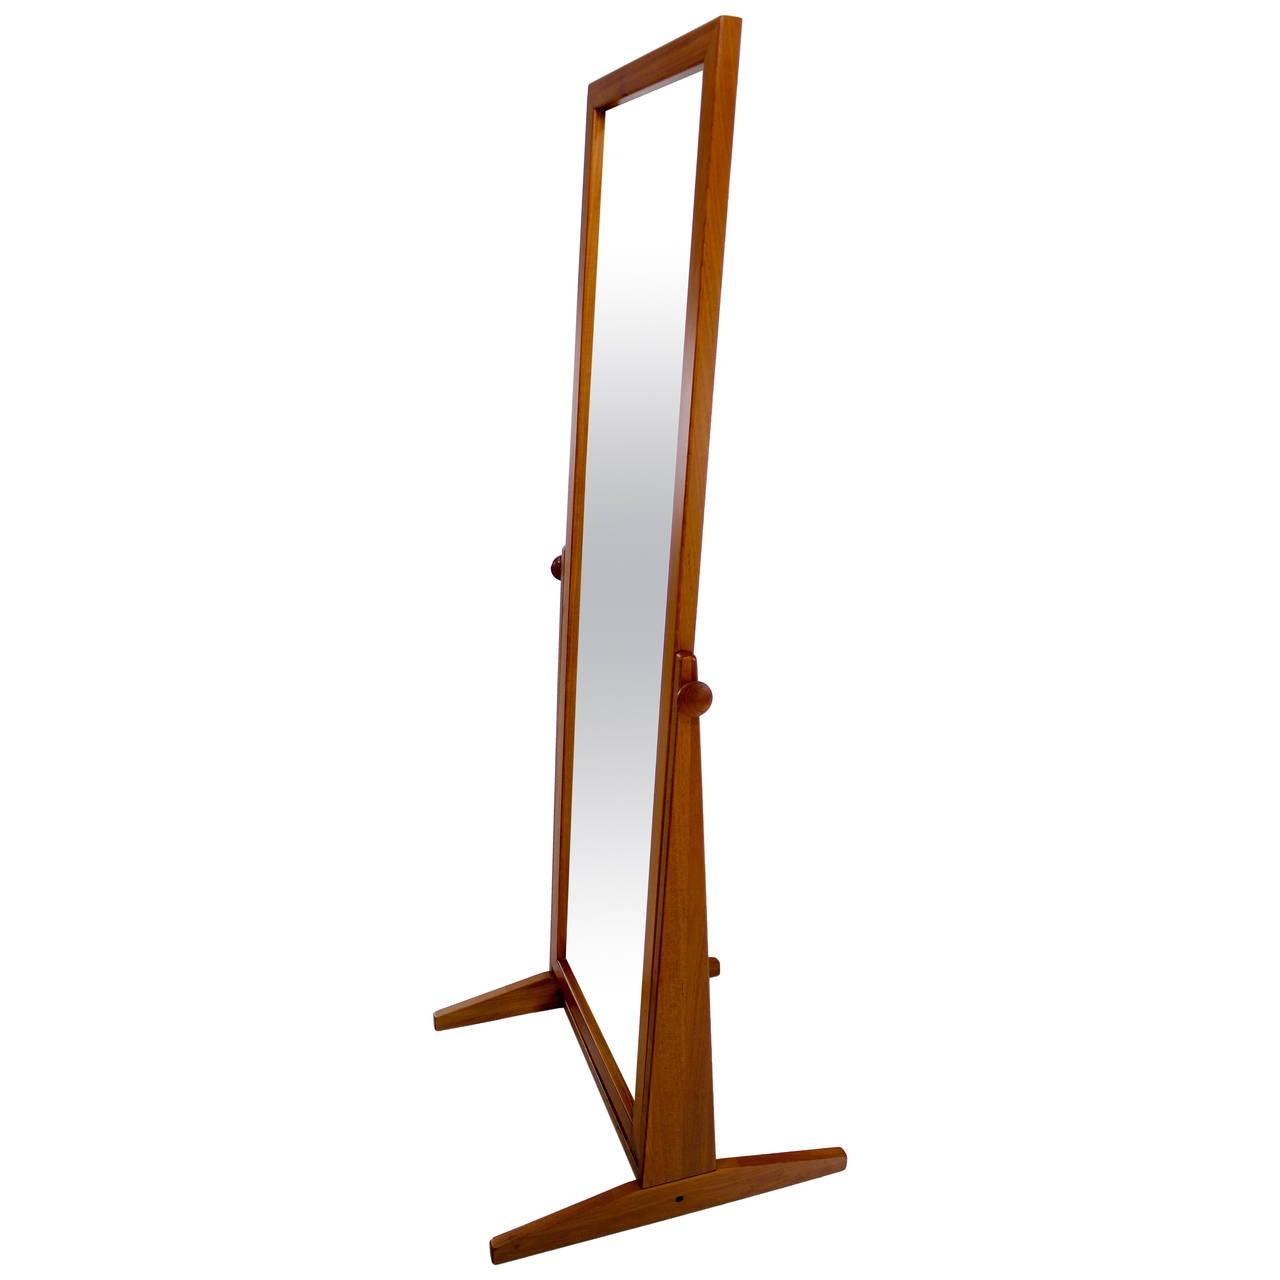 Danish Modern Teak Full Length Mirror By Pederson And